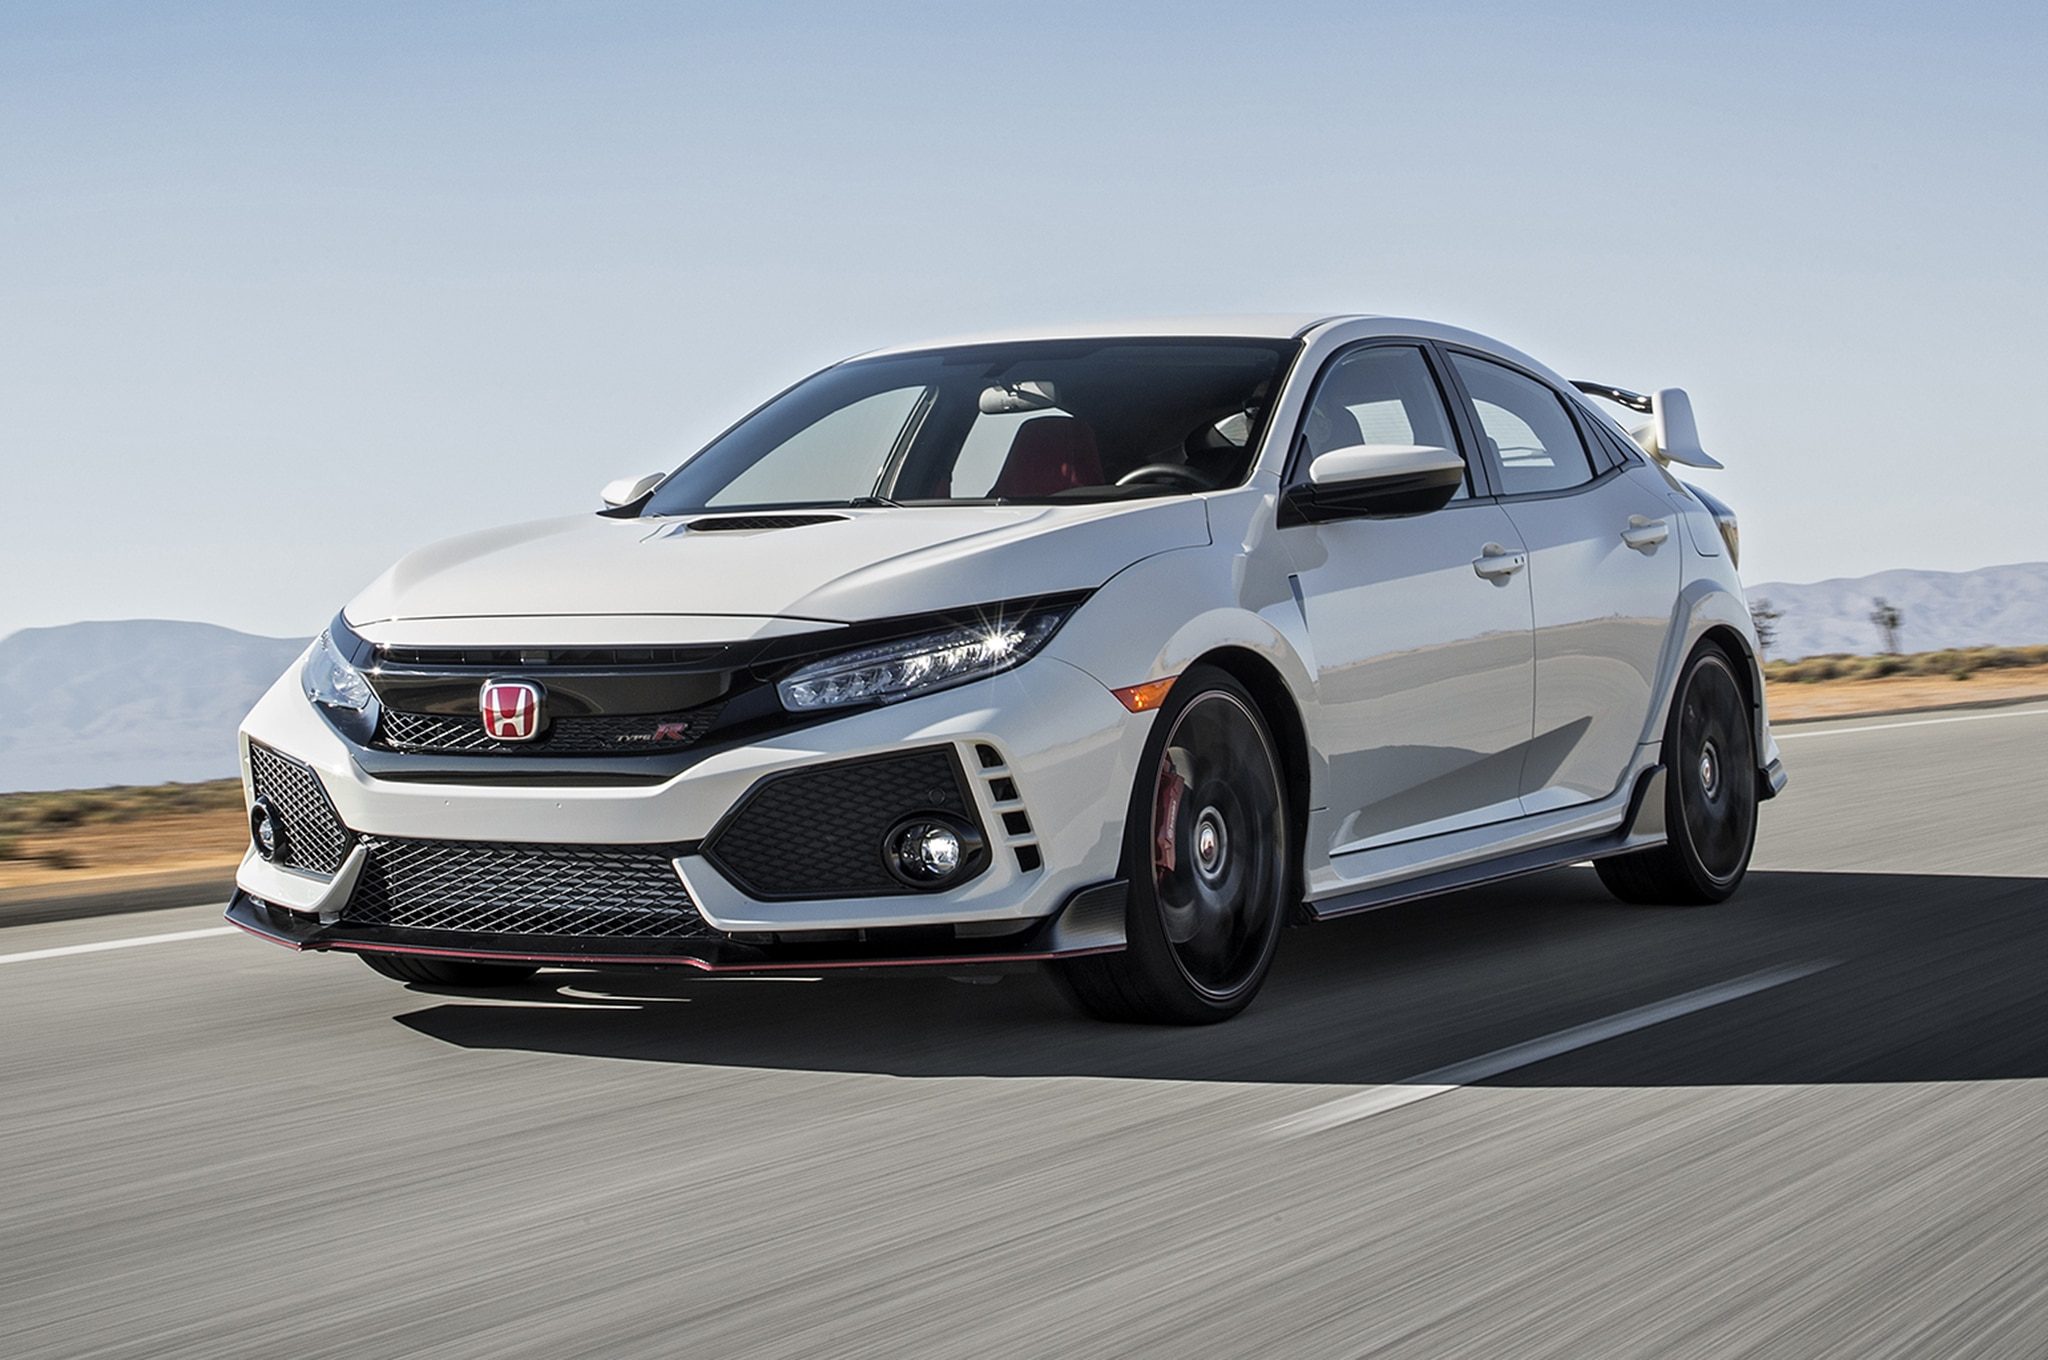 2017 Honda Civic Type R Front Three Quarter In Motion 1